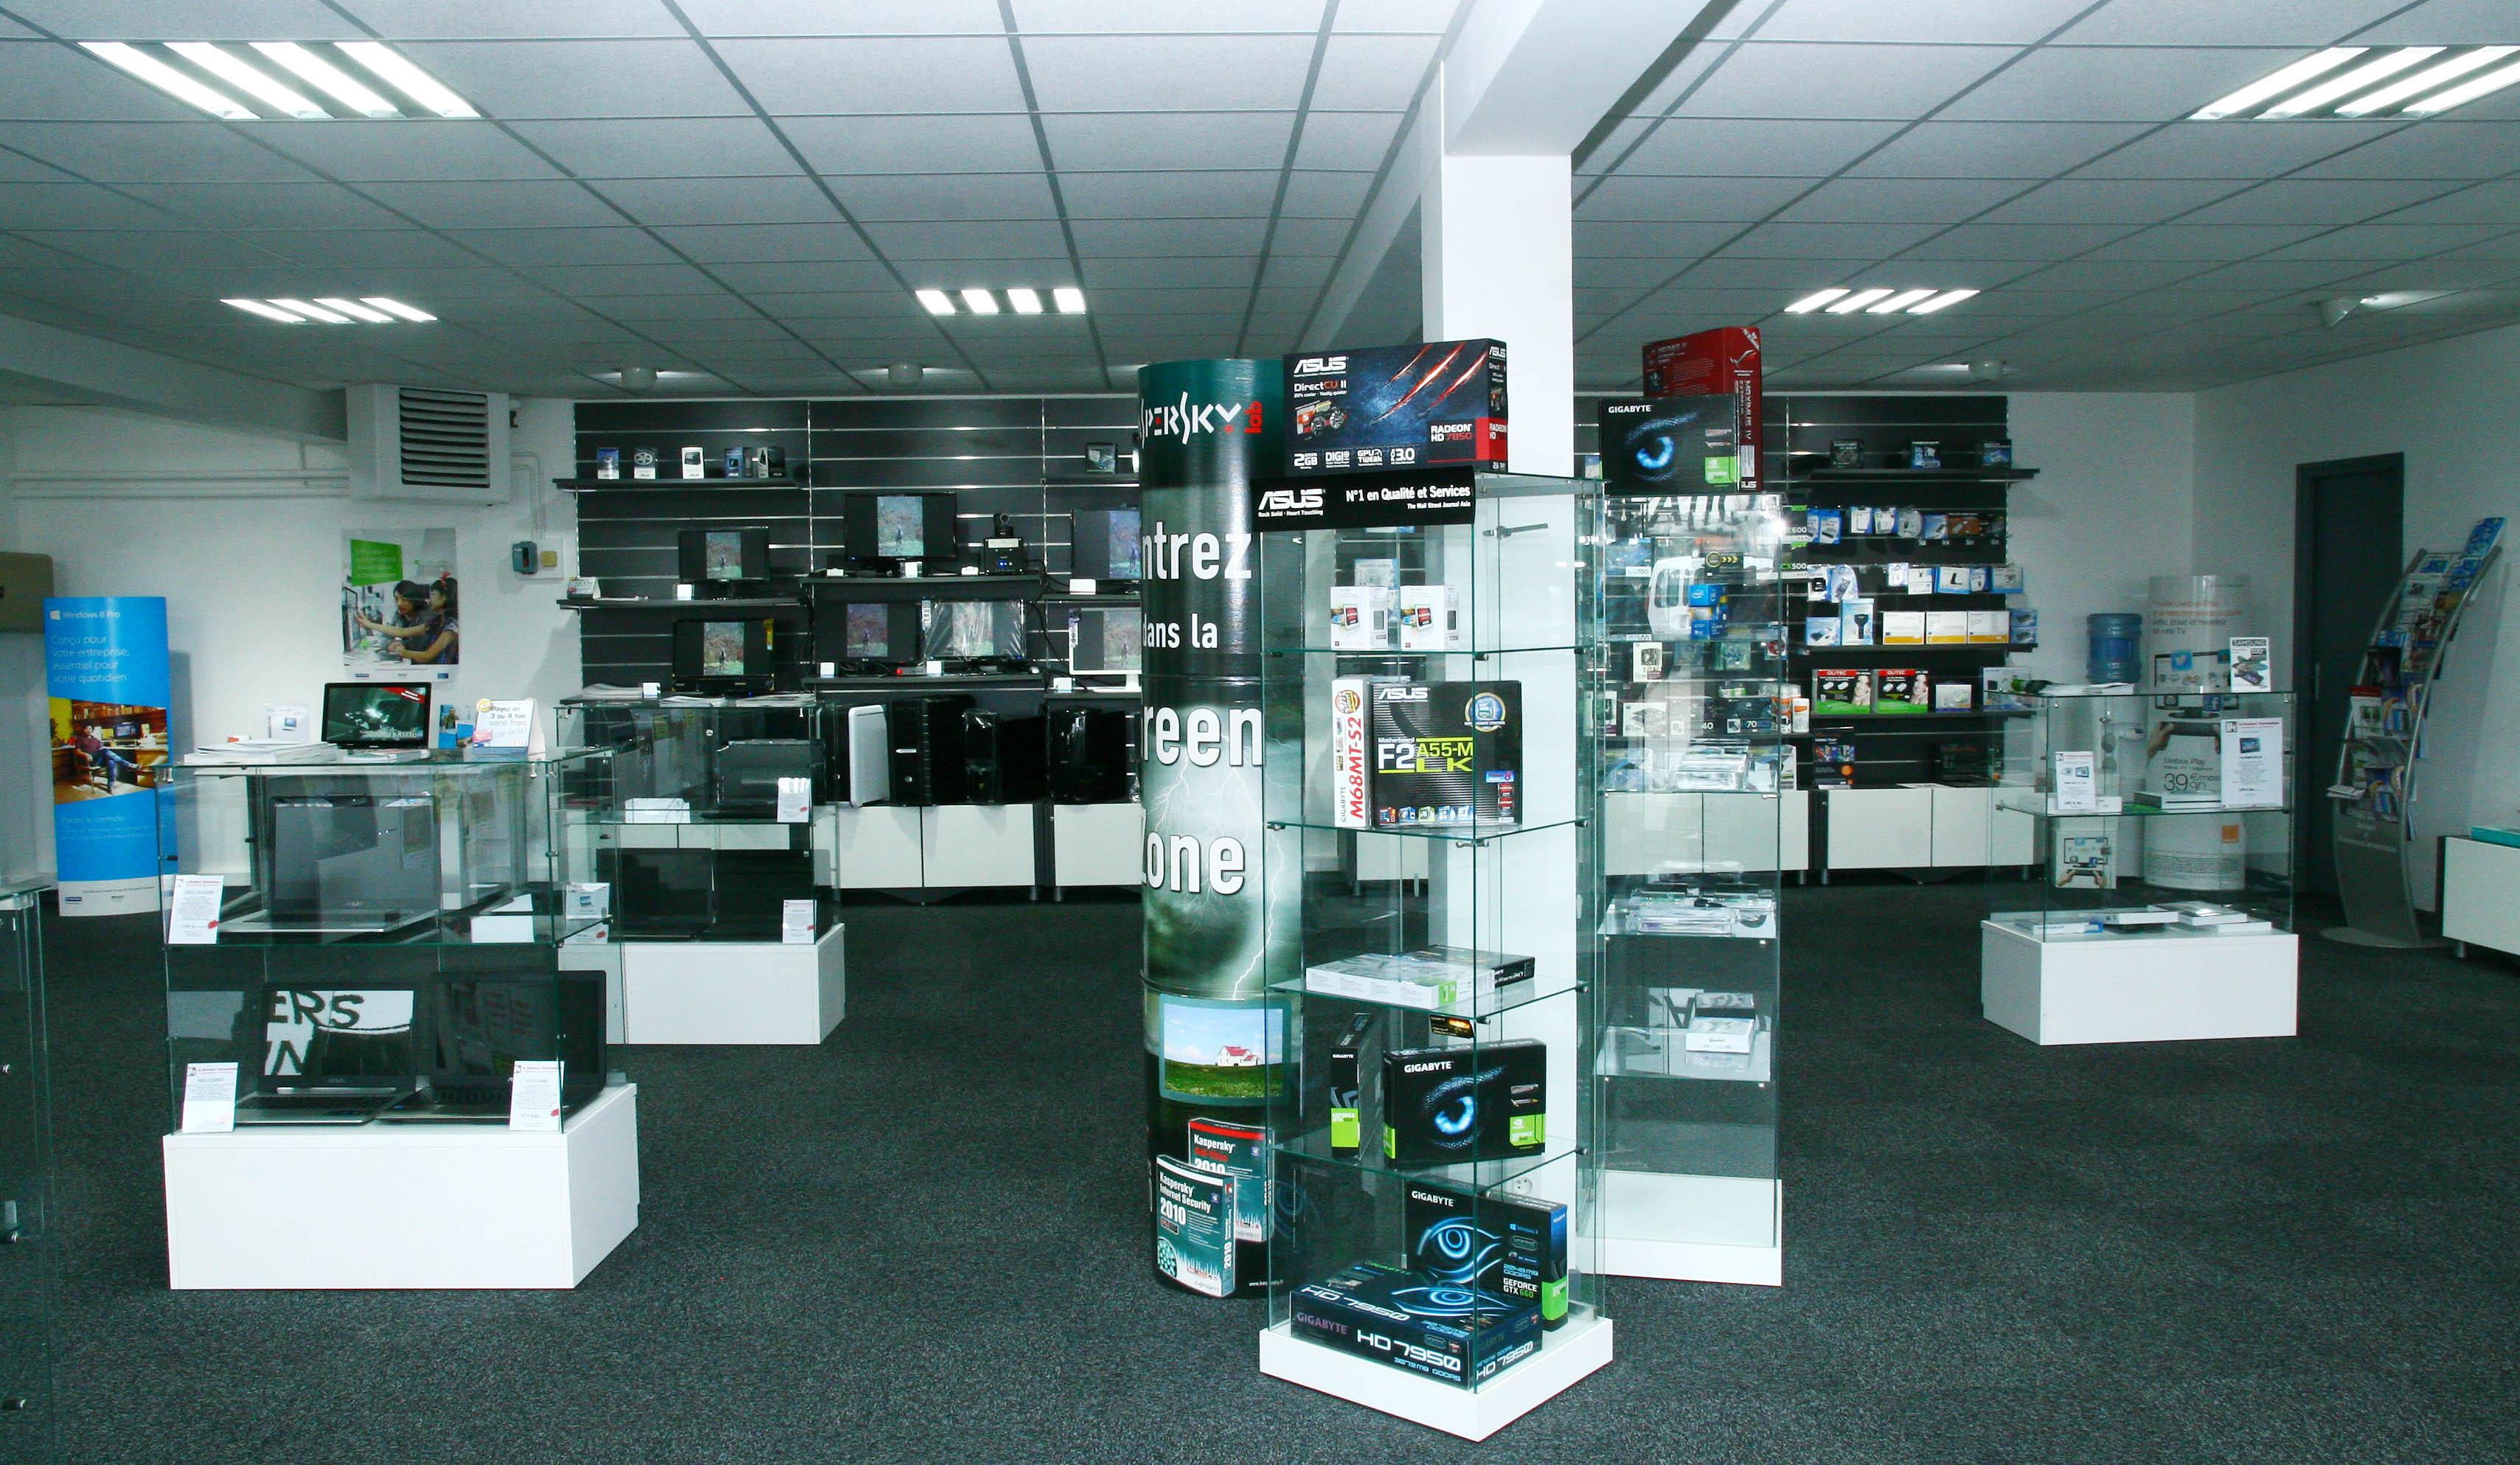 magasin d informatique